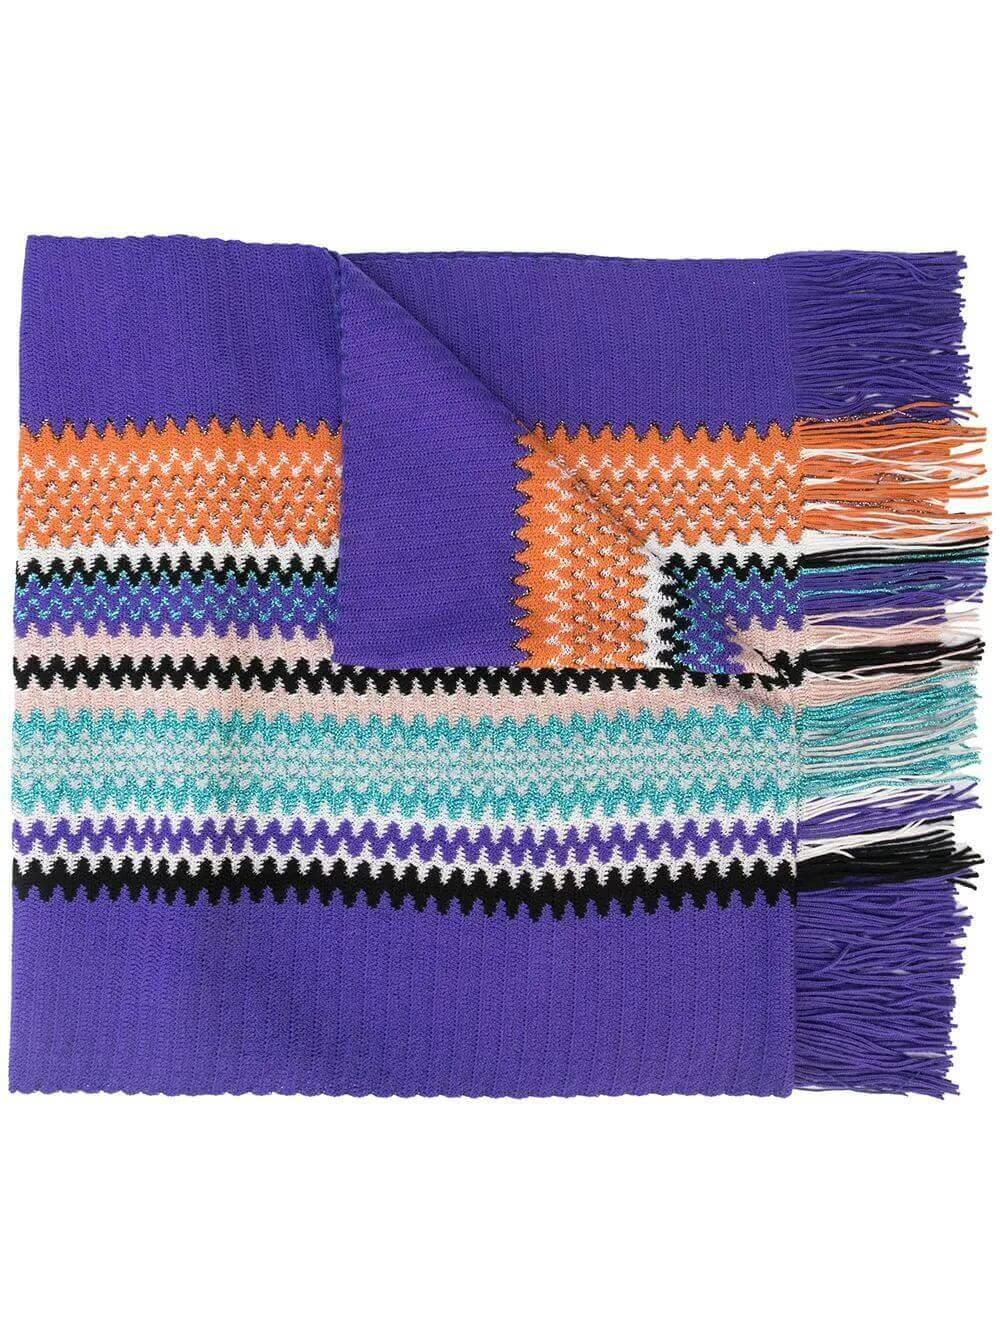 Zig- Zag Knit Scarf With Fringe Item # SC35WMD8068